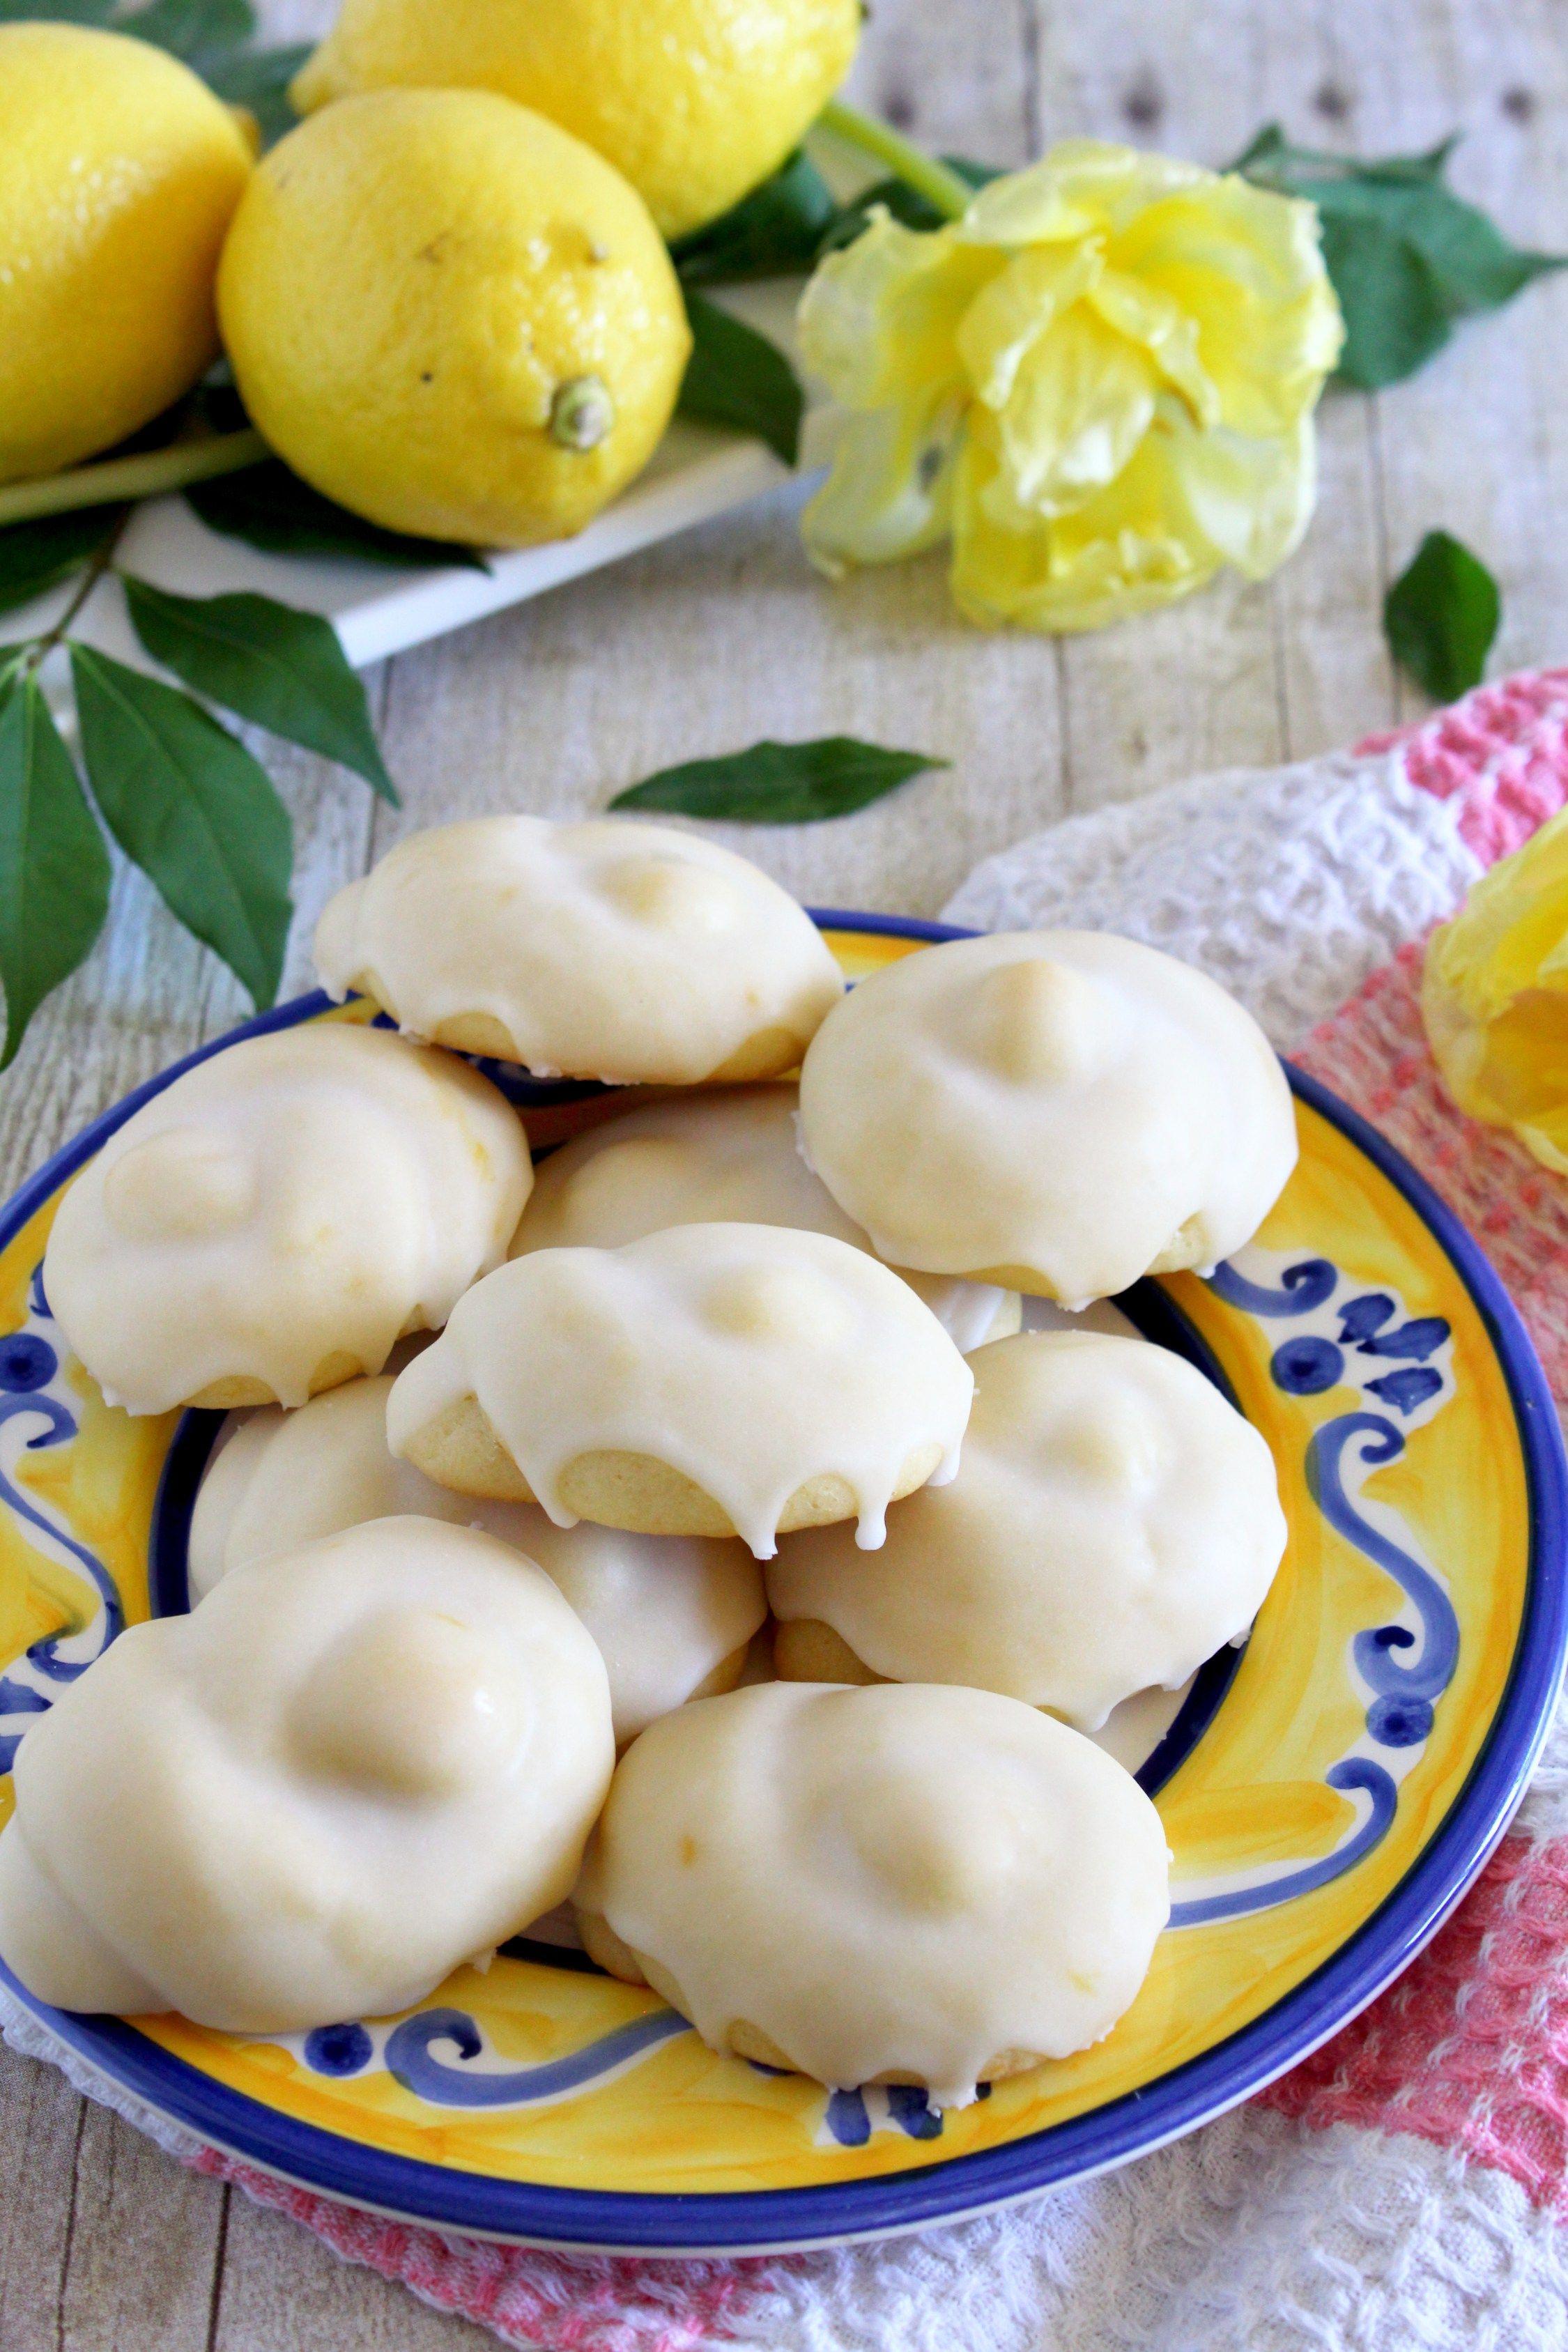 Taralluci al limone are traditional Italian lemon cookies. Soft and tender and t... -  Taralluci al